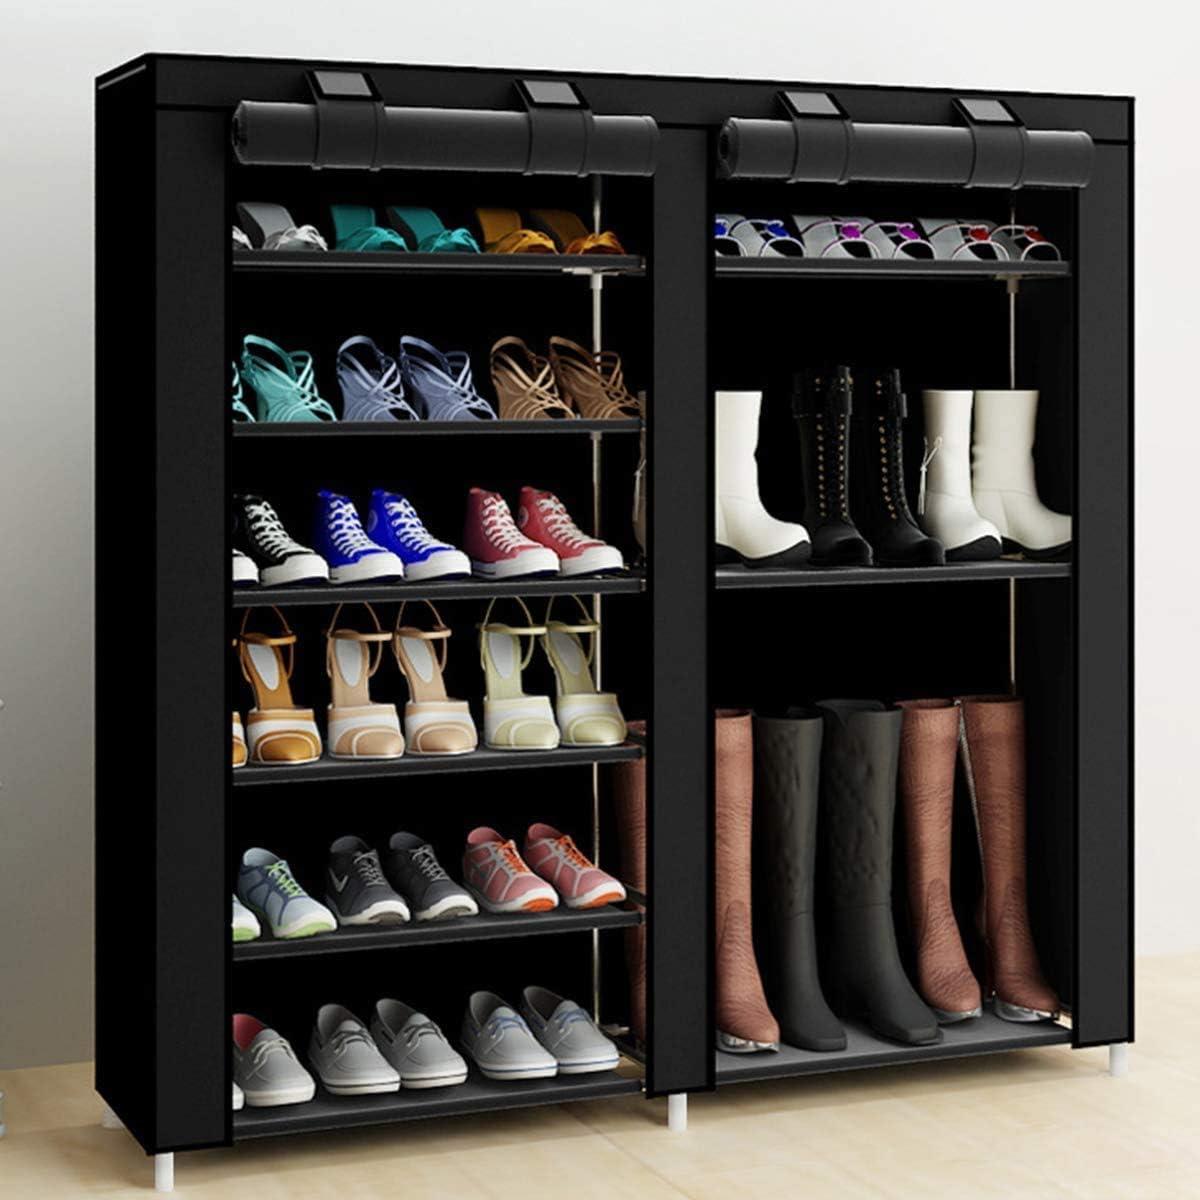 Shoe Rack Now free shipping Storage Organizer Detroit Mall Astoryou 7 Tier Double Row Sta Free